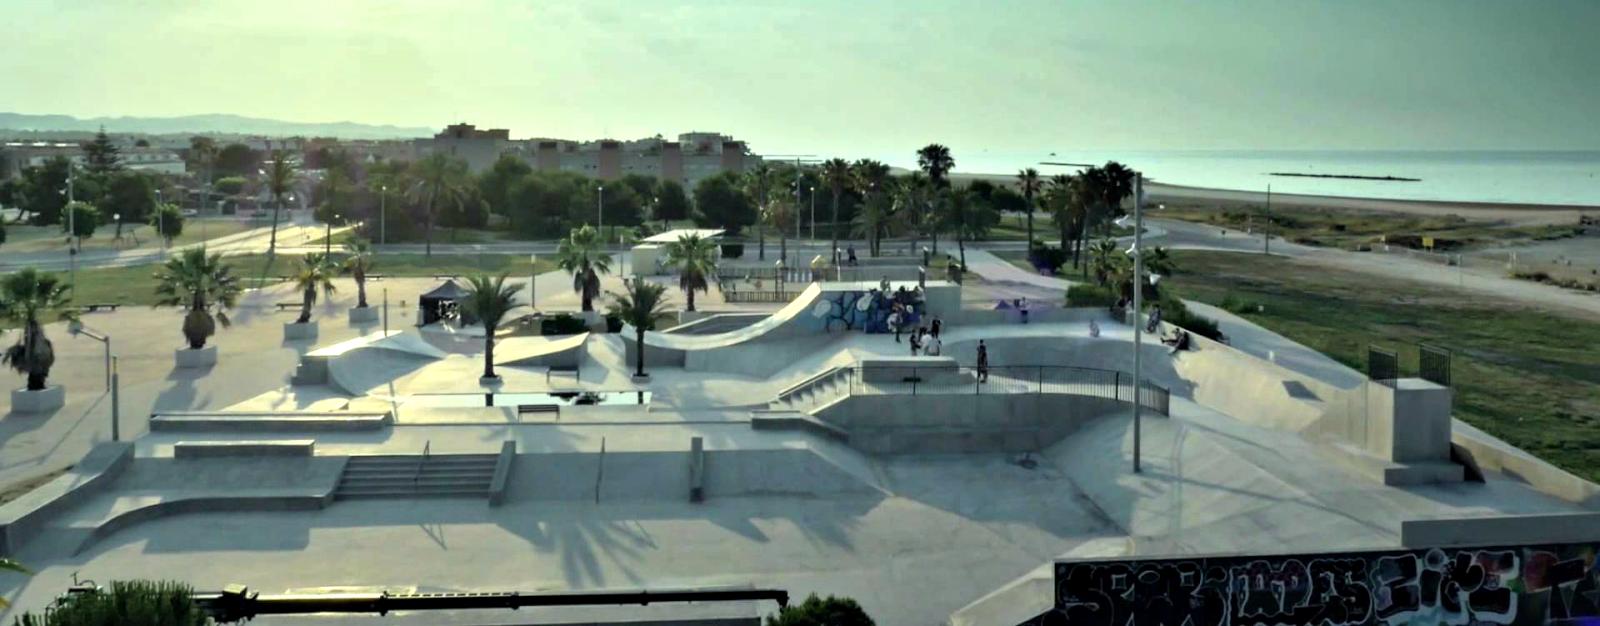 hoverpark hoverboard